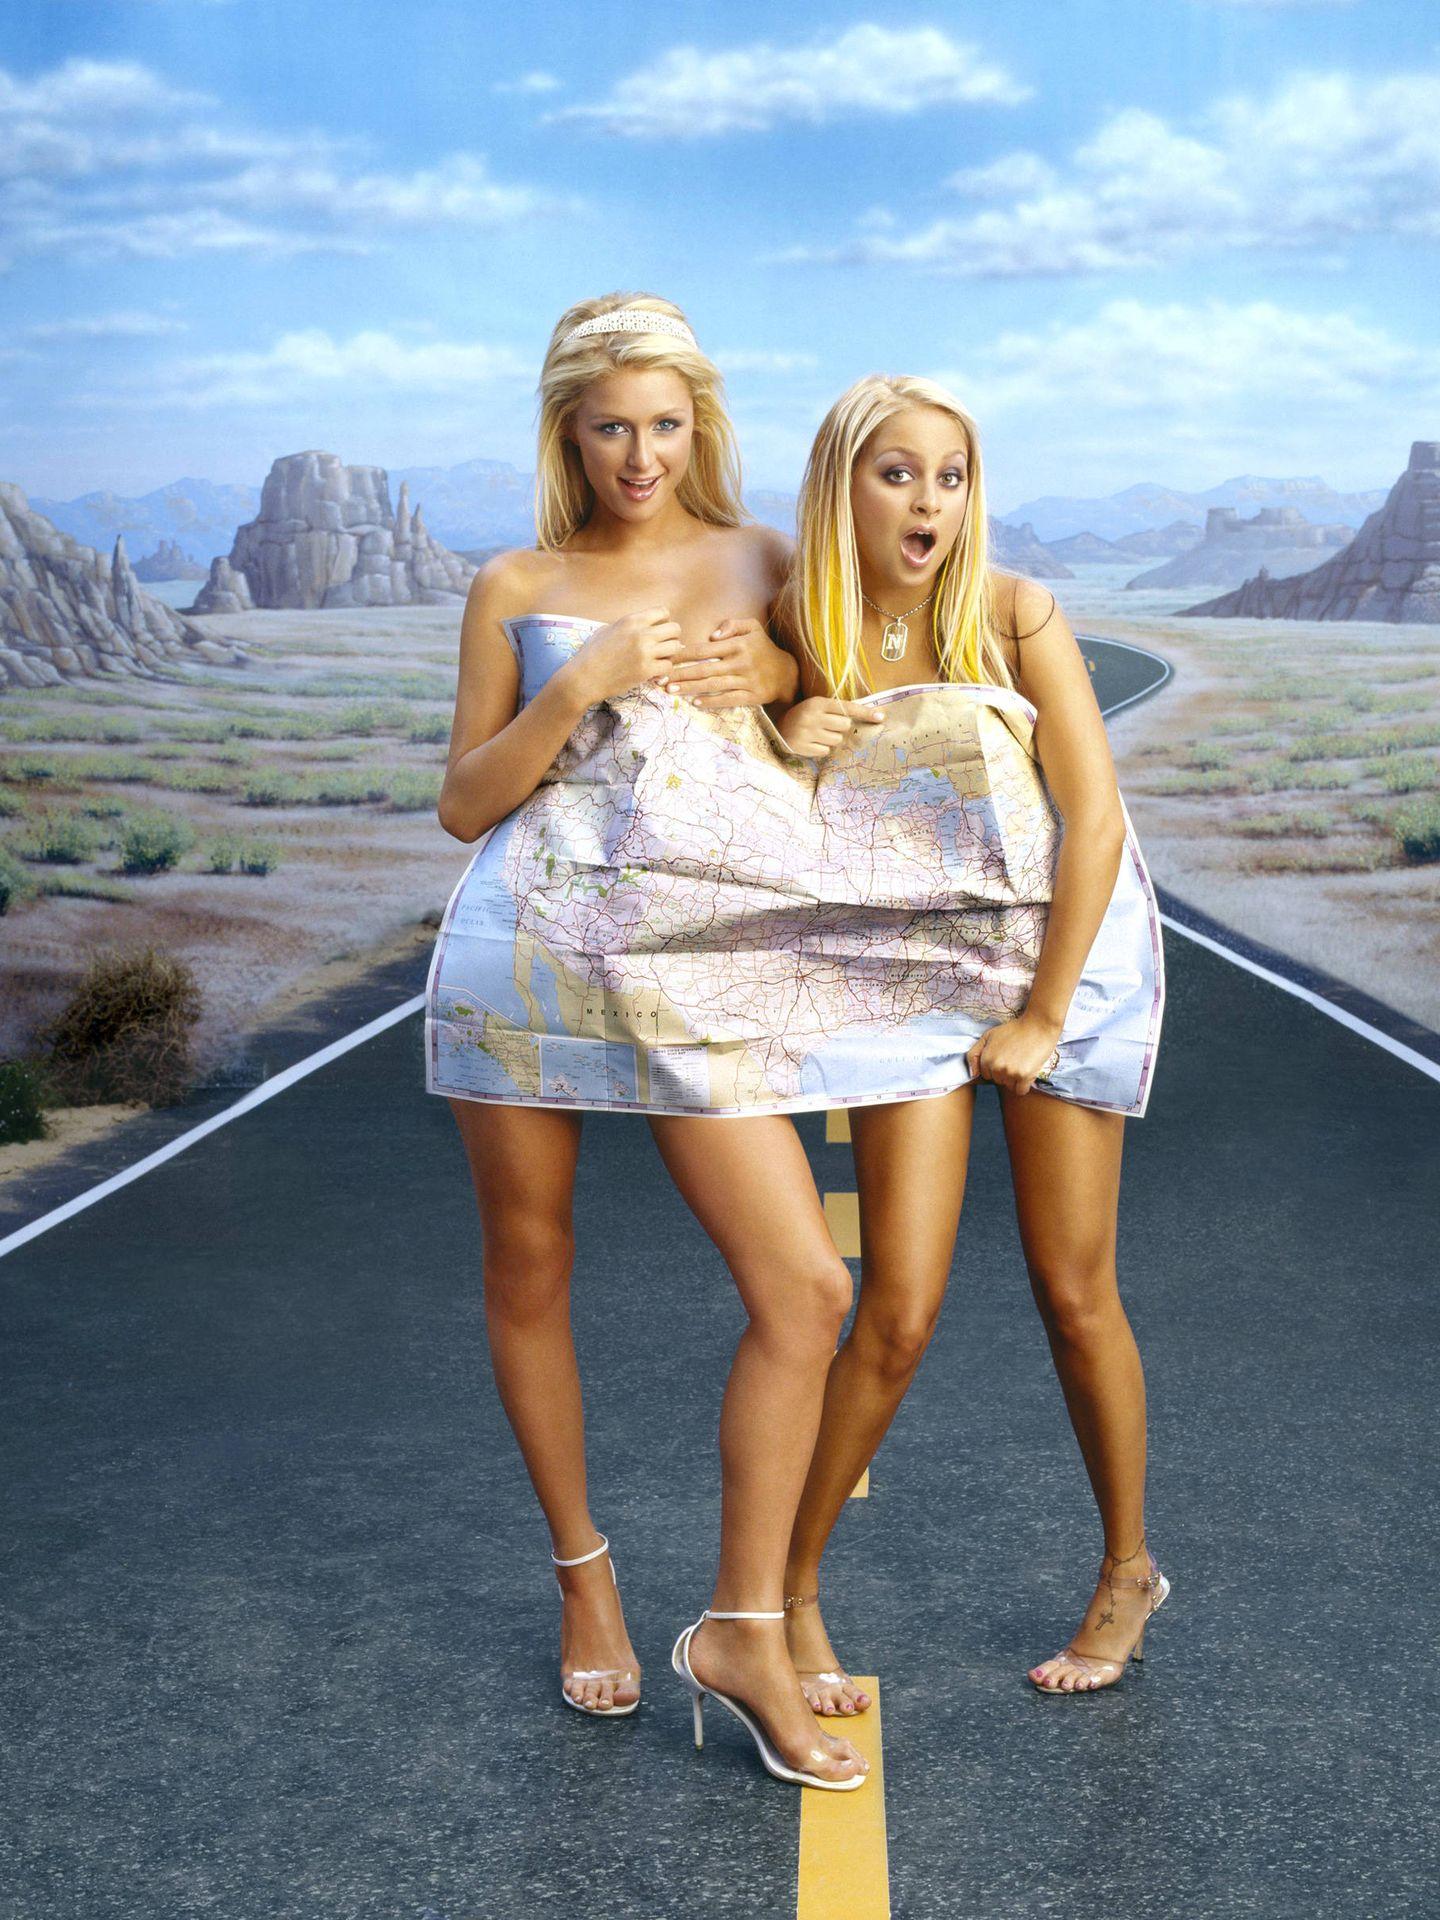 Paris Hilton y Nicole Richie, en 'The simple life' 2004. (Cordon Press)